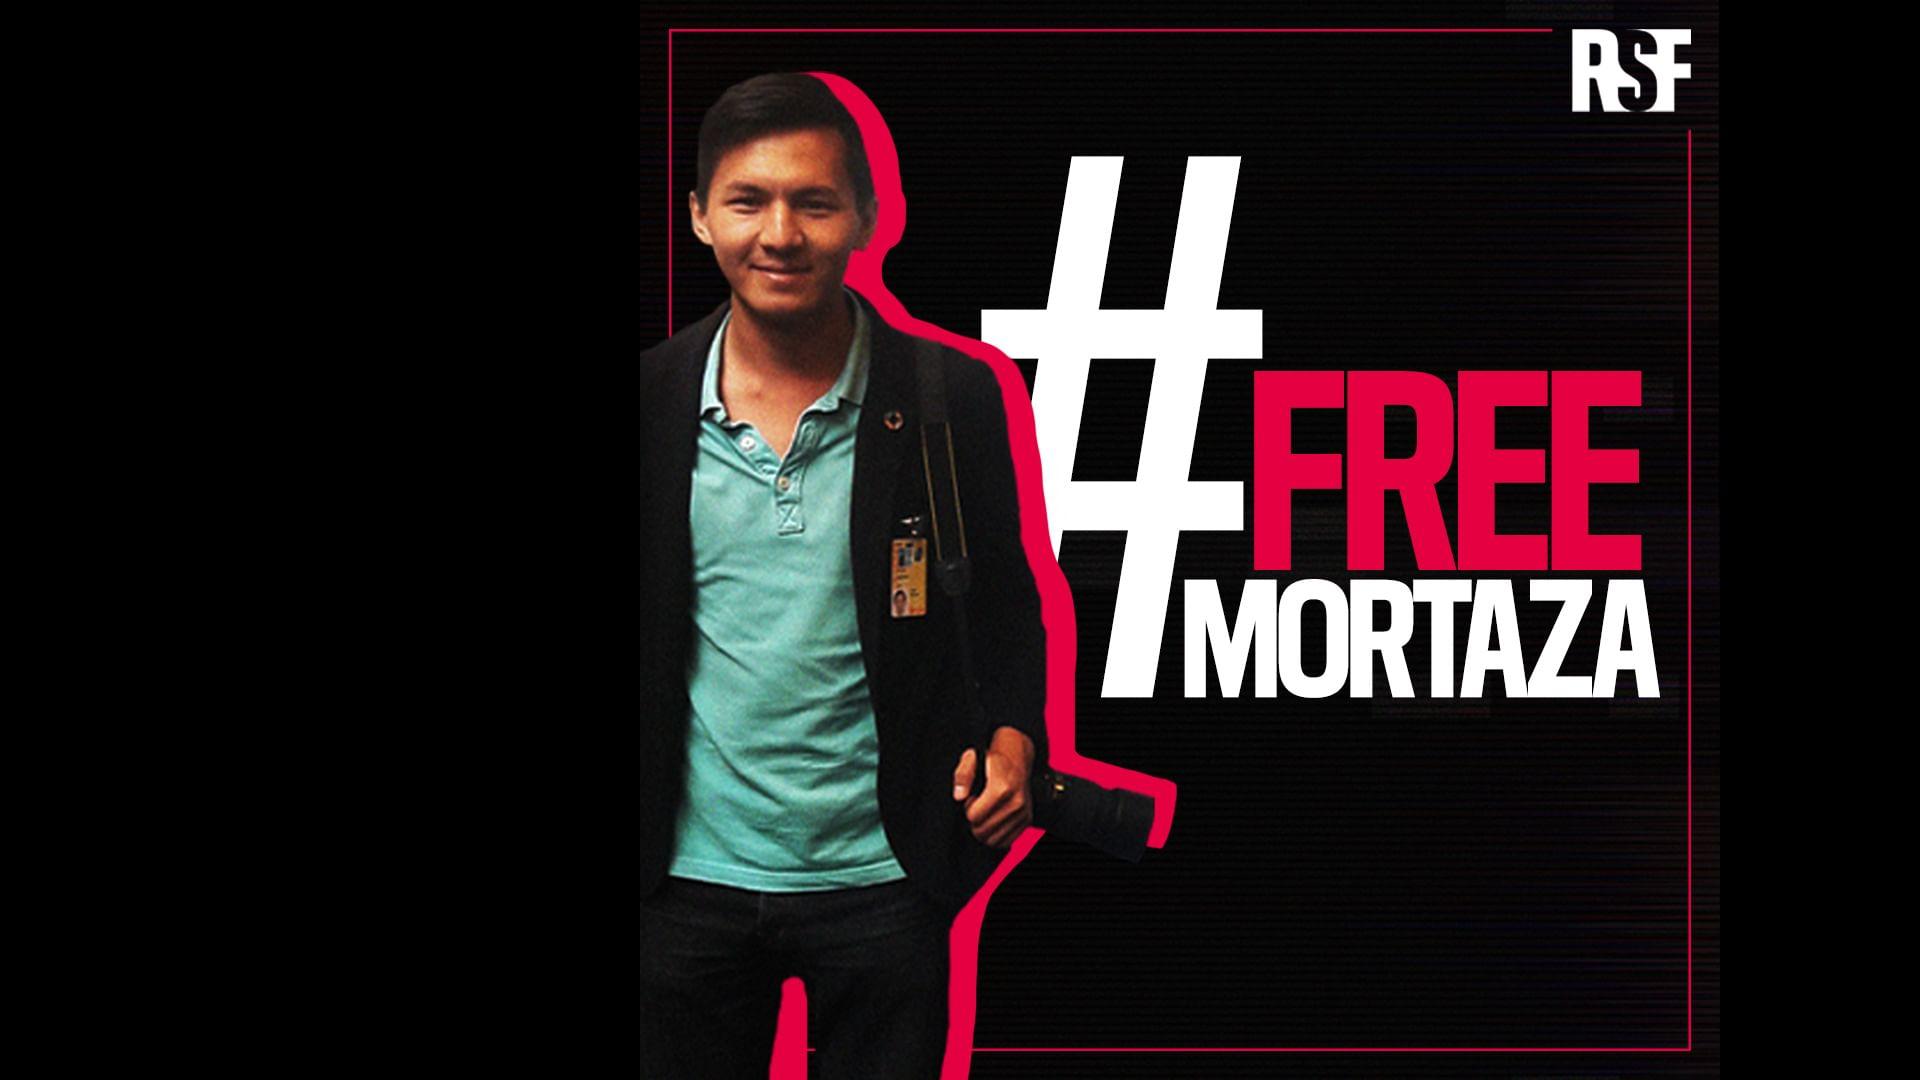 Griechenland: Humanitäre Krise an der Schwelle zu Europa